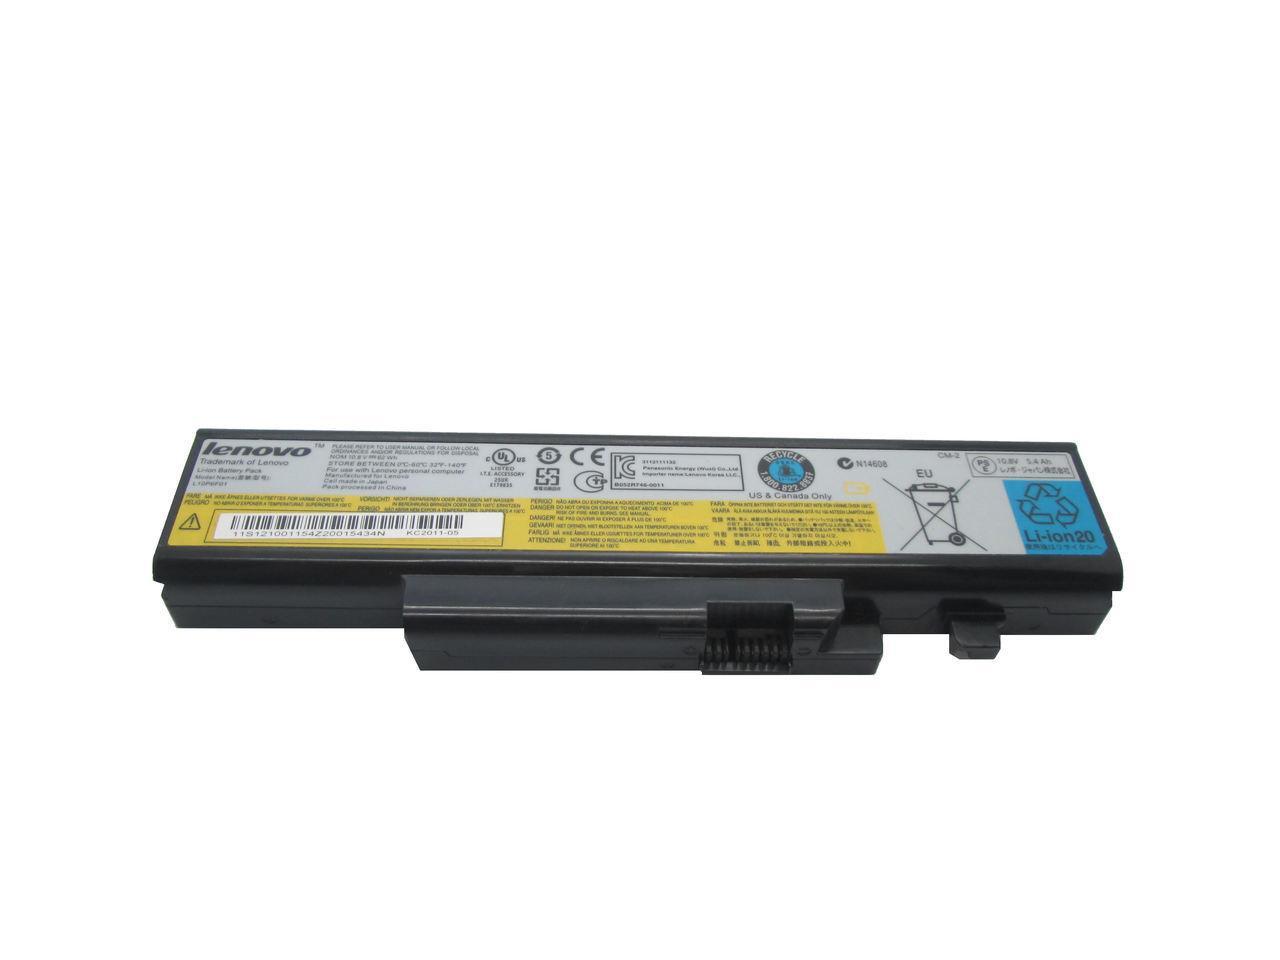 Аккумулятор для Ноутбука Lenovo Ideapad Y570, L10S6Y02 (10.8v 5200 mAh)